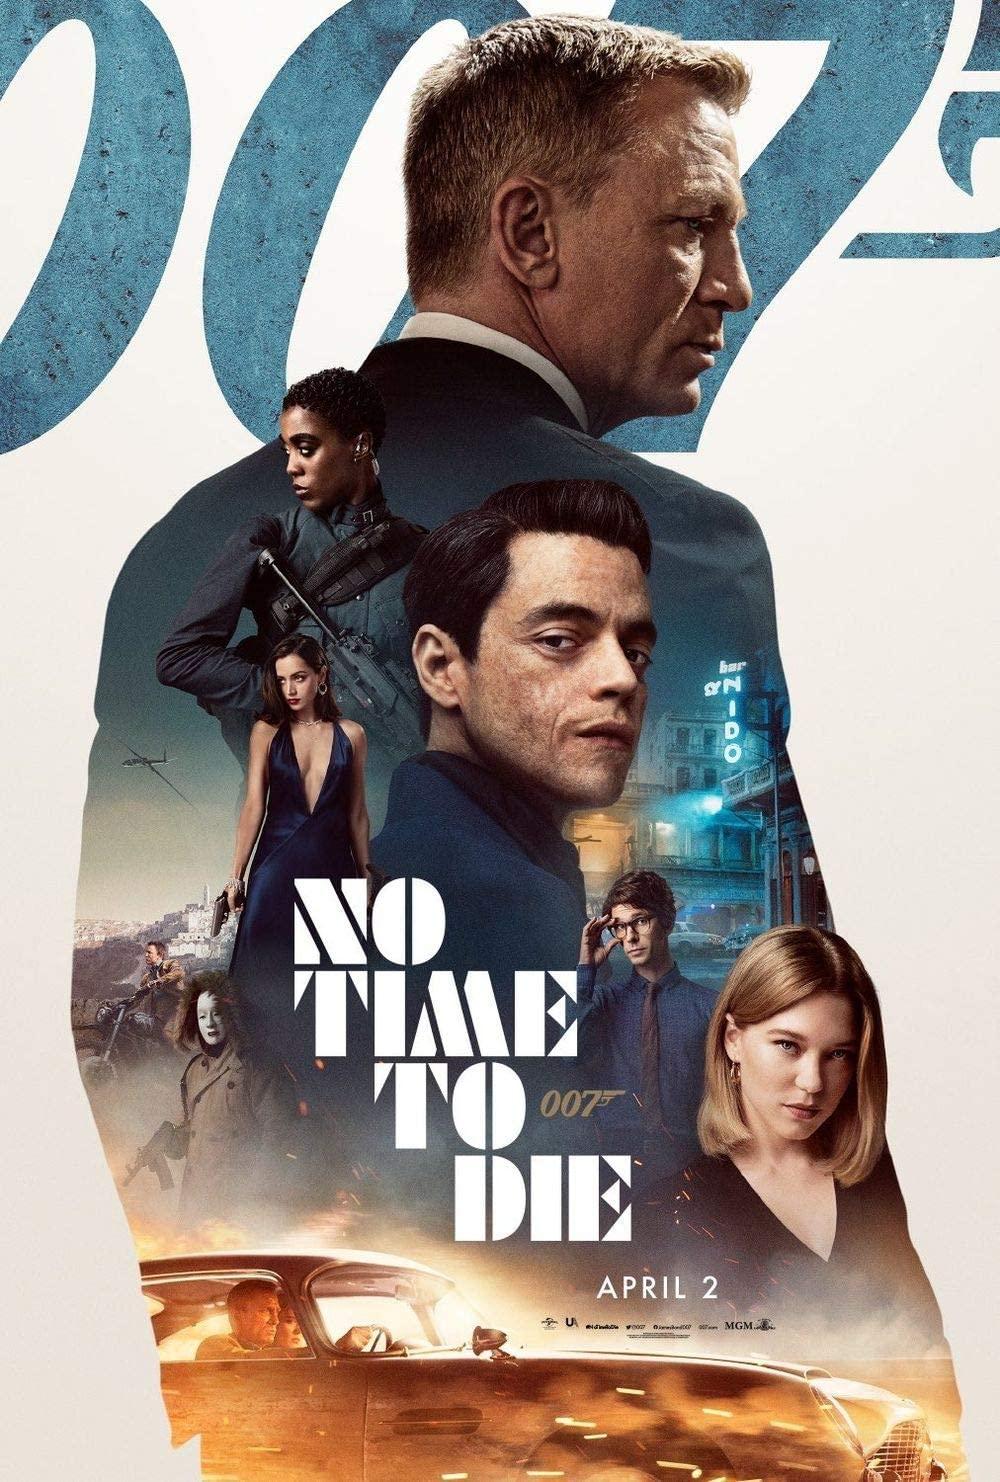 phim 007 - NO TIME TO DIE